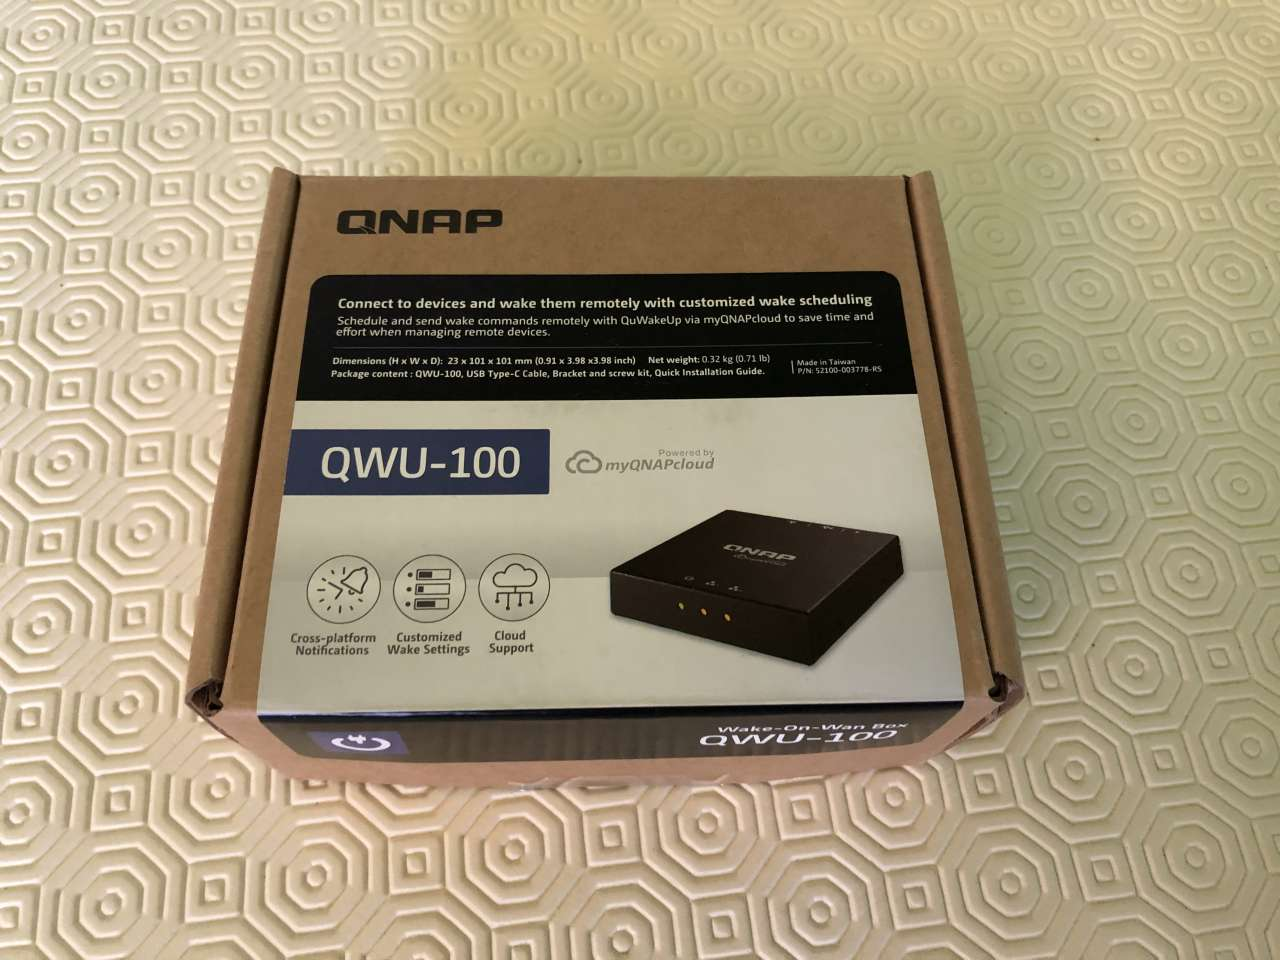 QNAP QWU-100 - Scatola